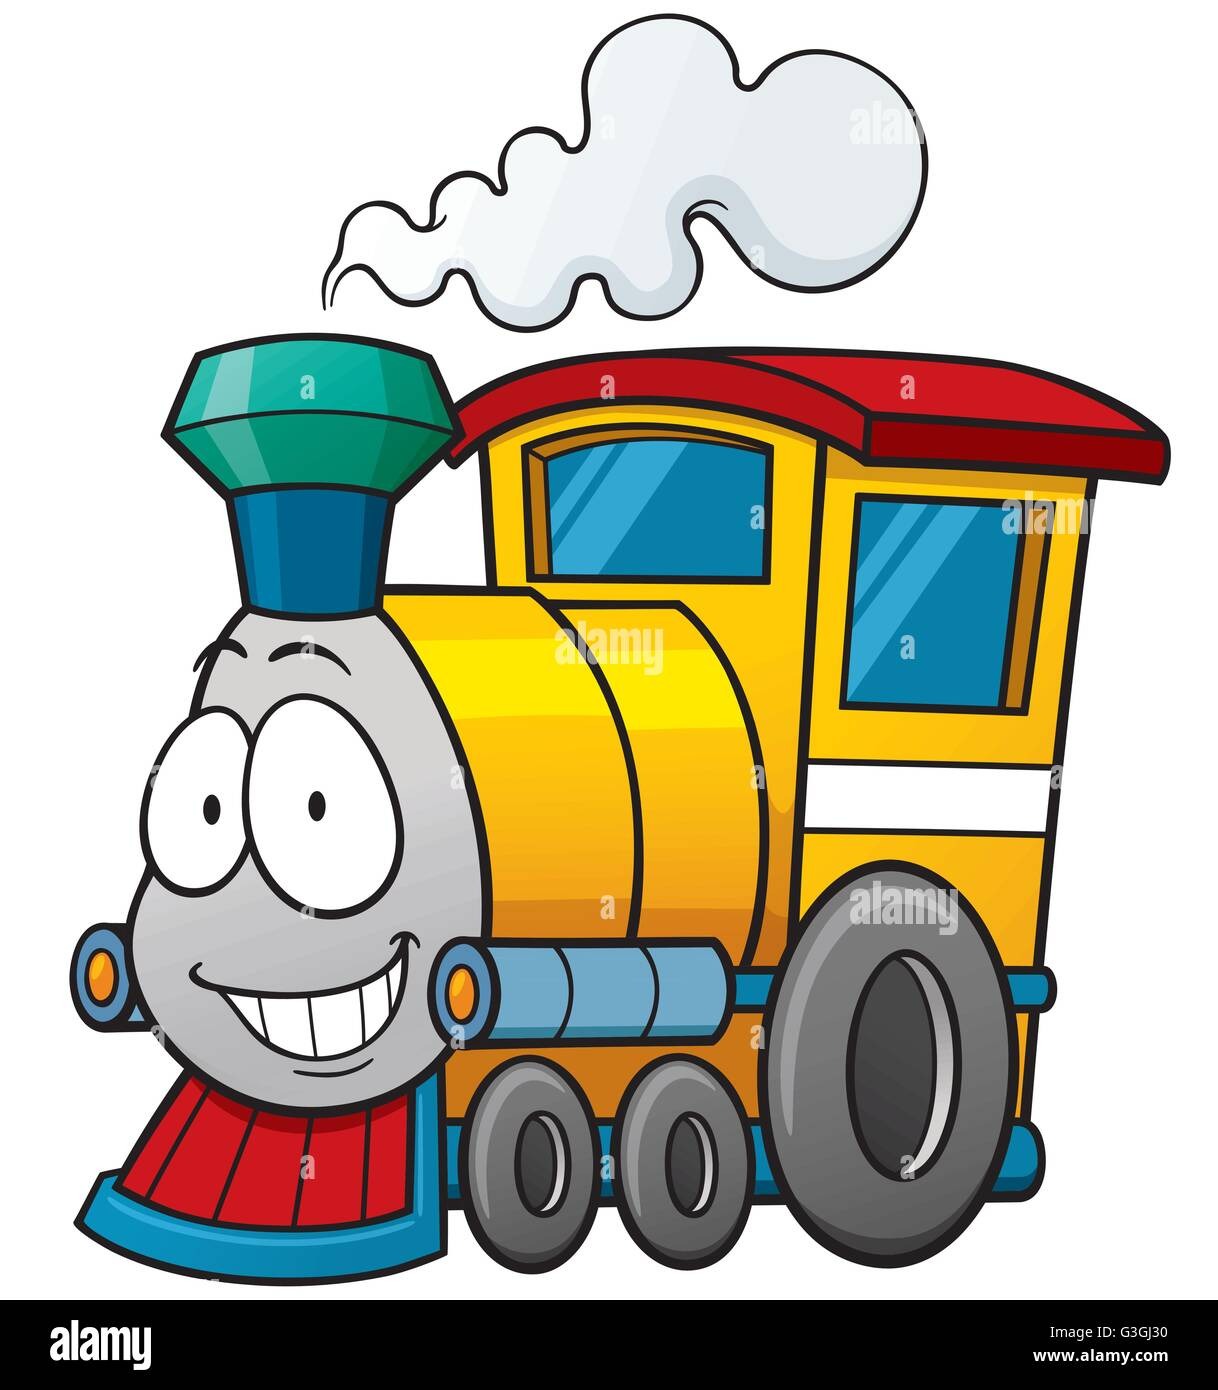 Cartoon Train Stock Photos Cartoon Train Stock Images Alamy